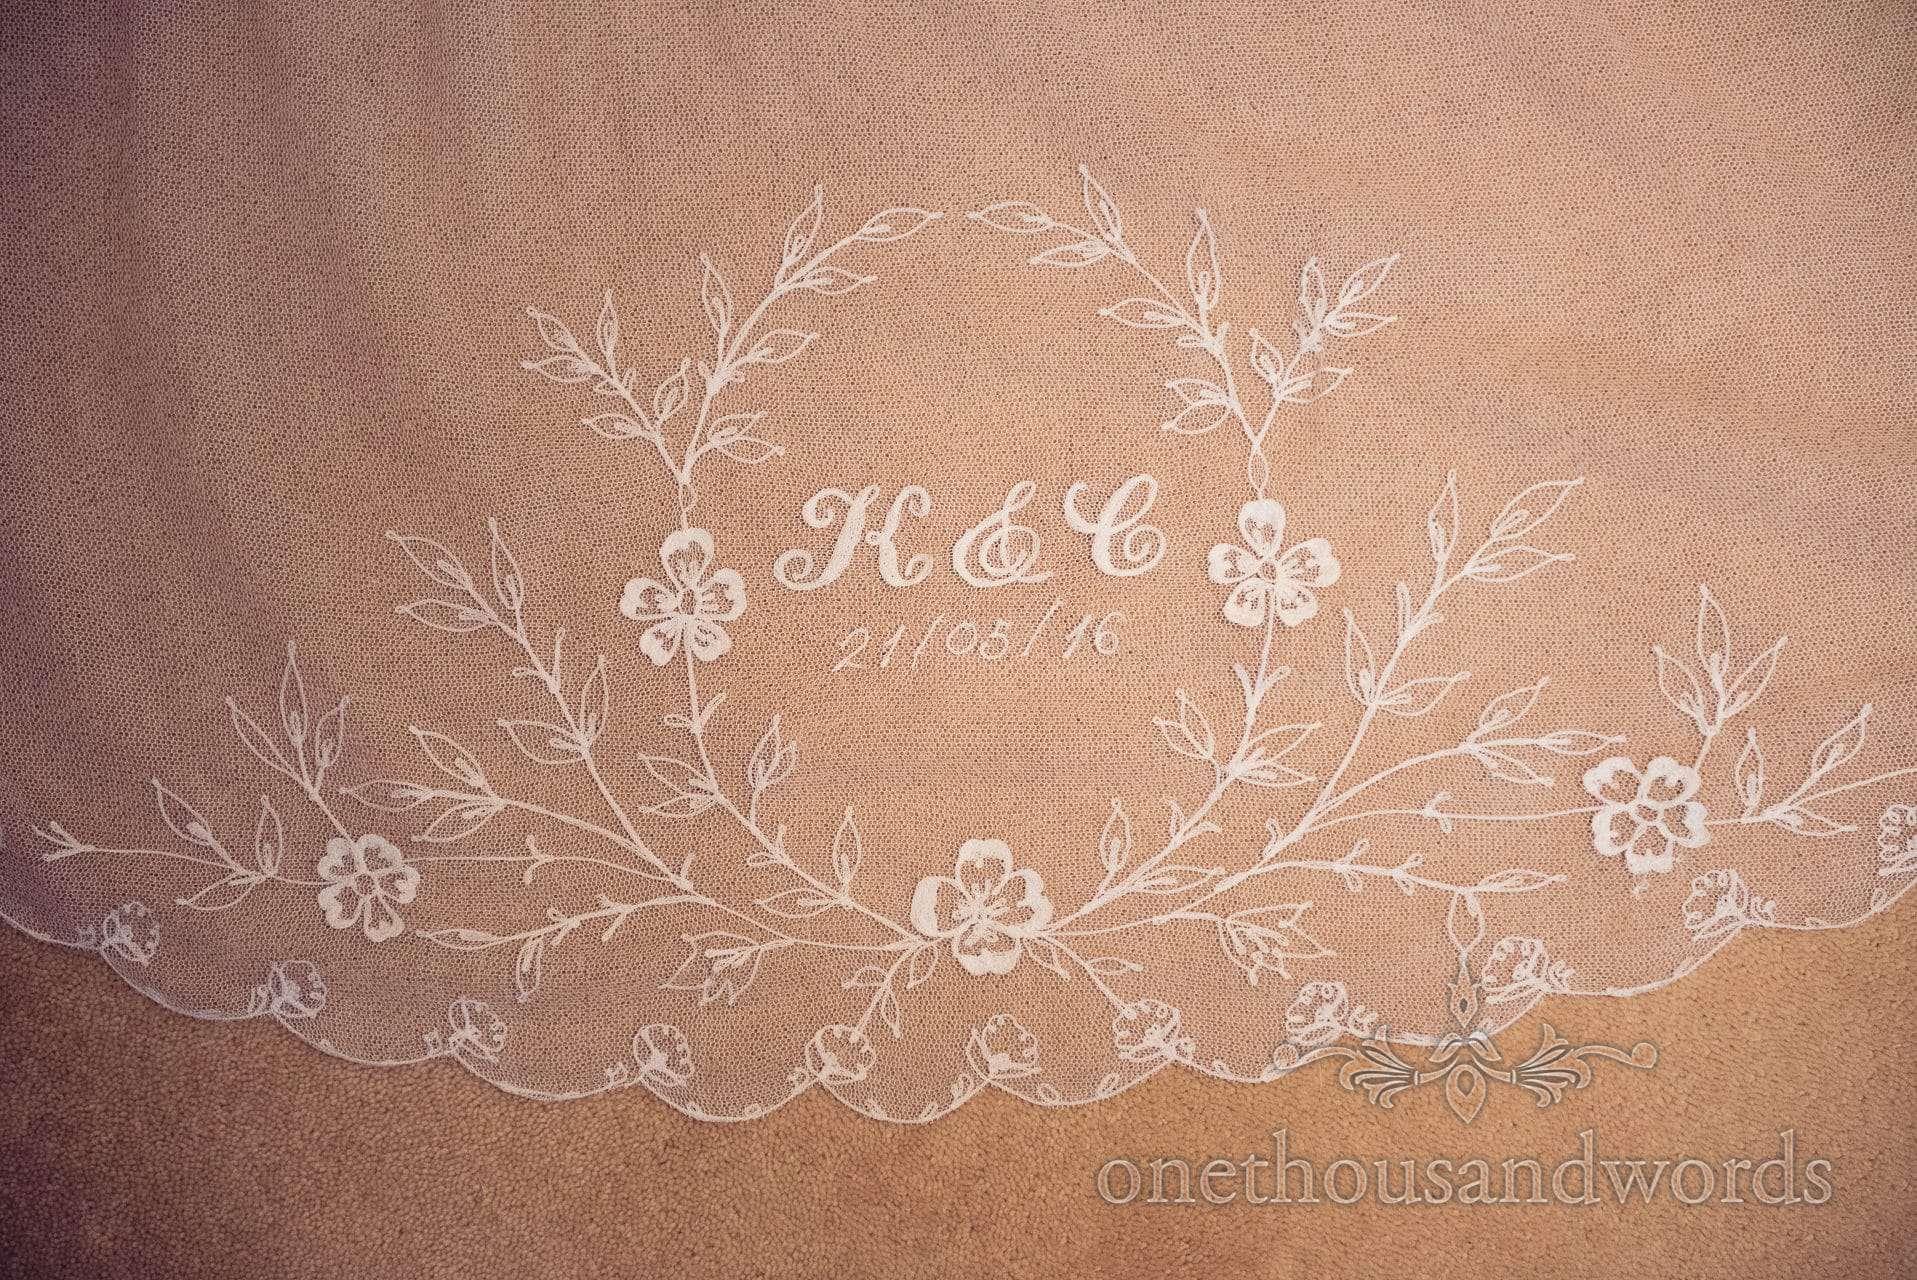 Monogram embroidery on wedding veil